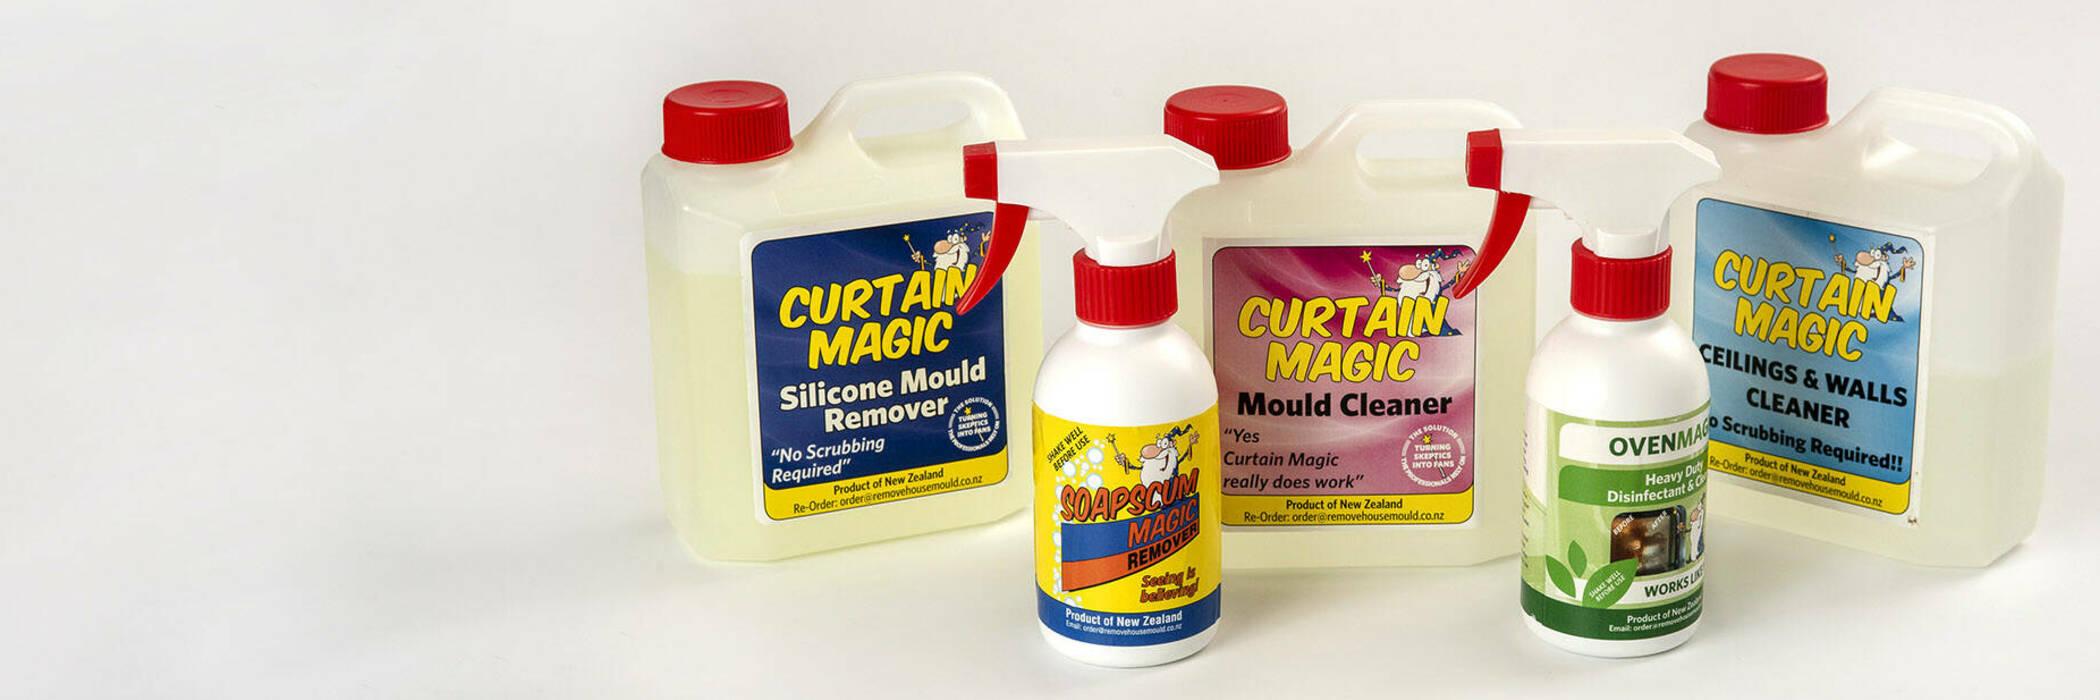 Curtain Magic products